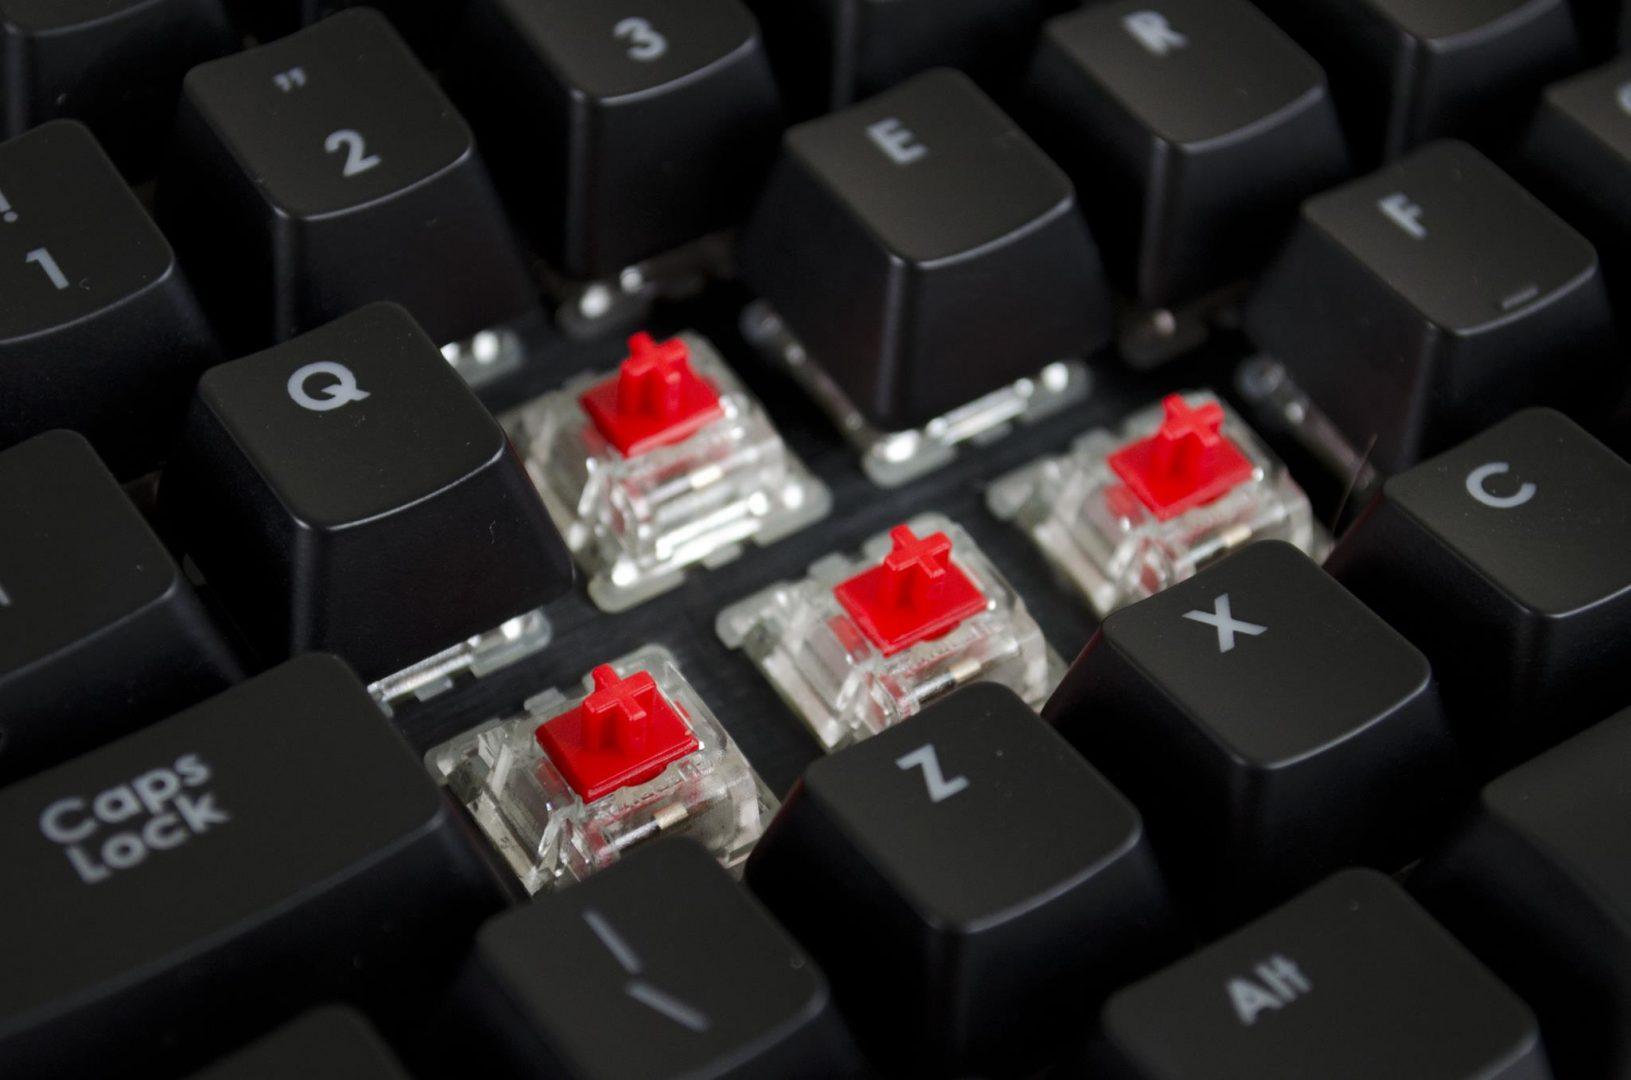 Corsair K70 RGB Mechanical Keyboard_16